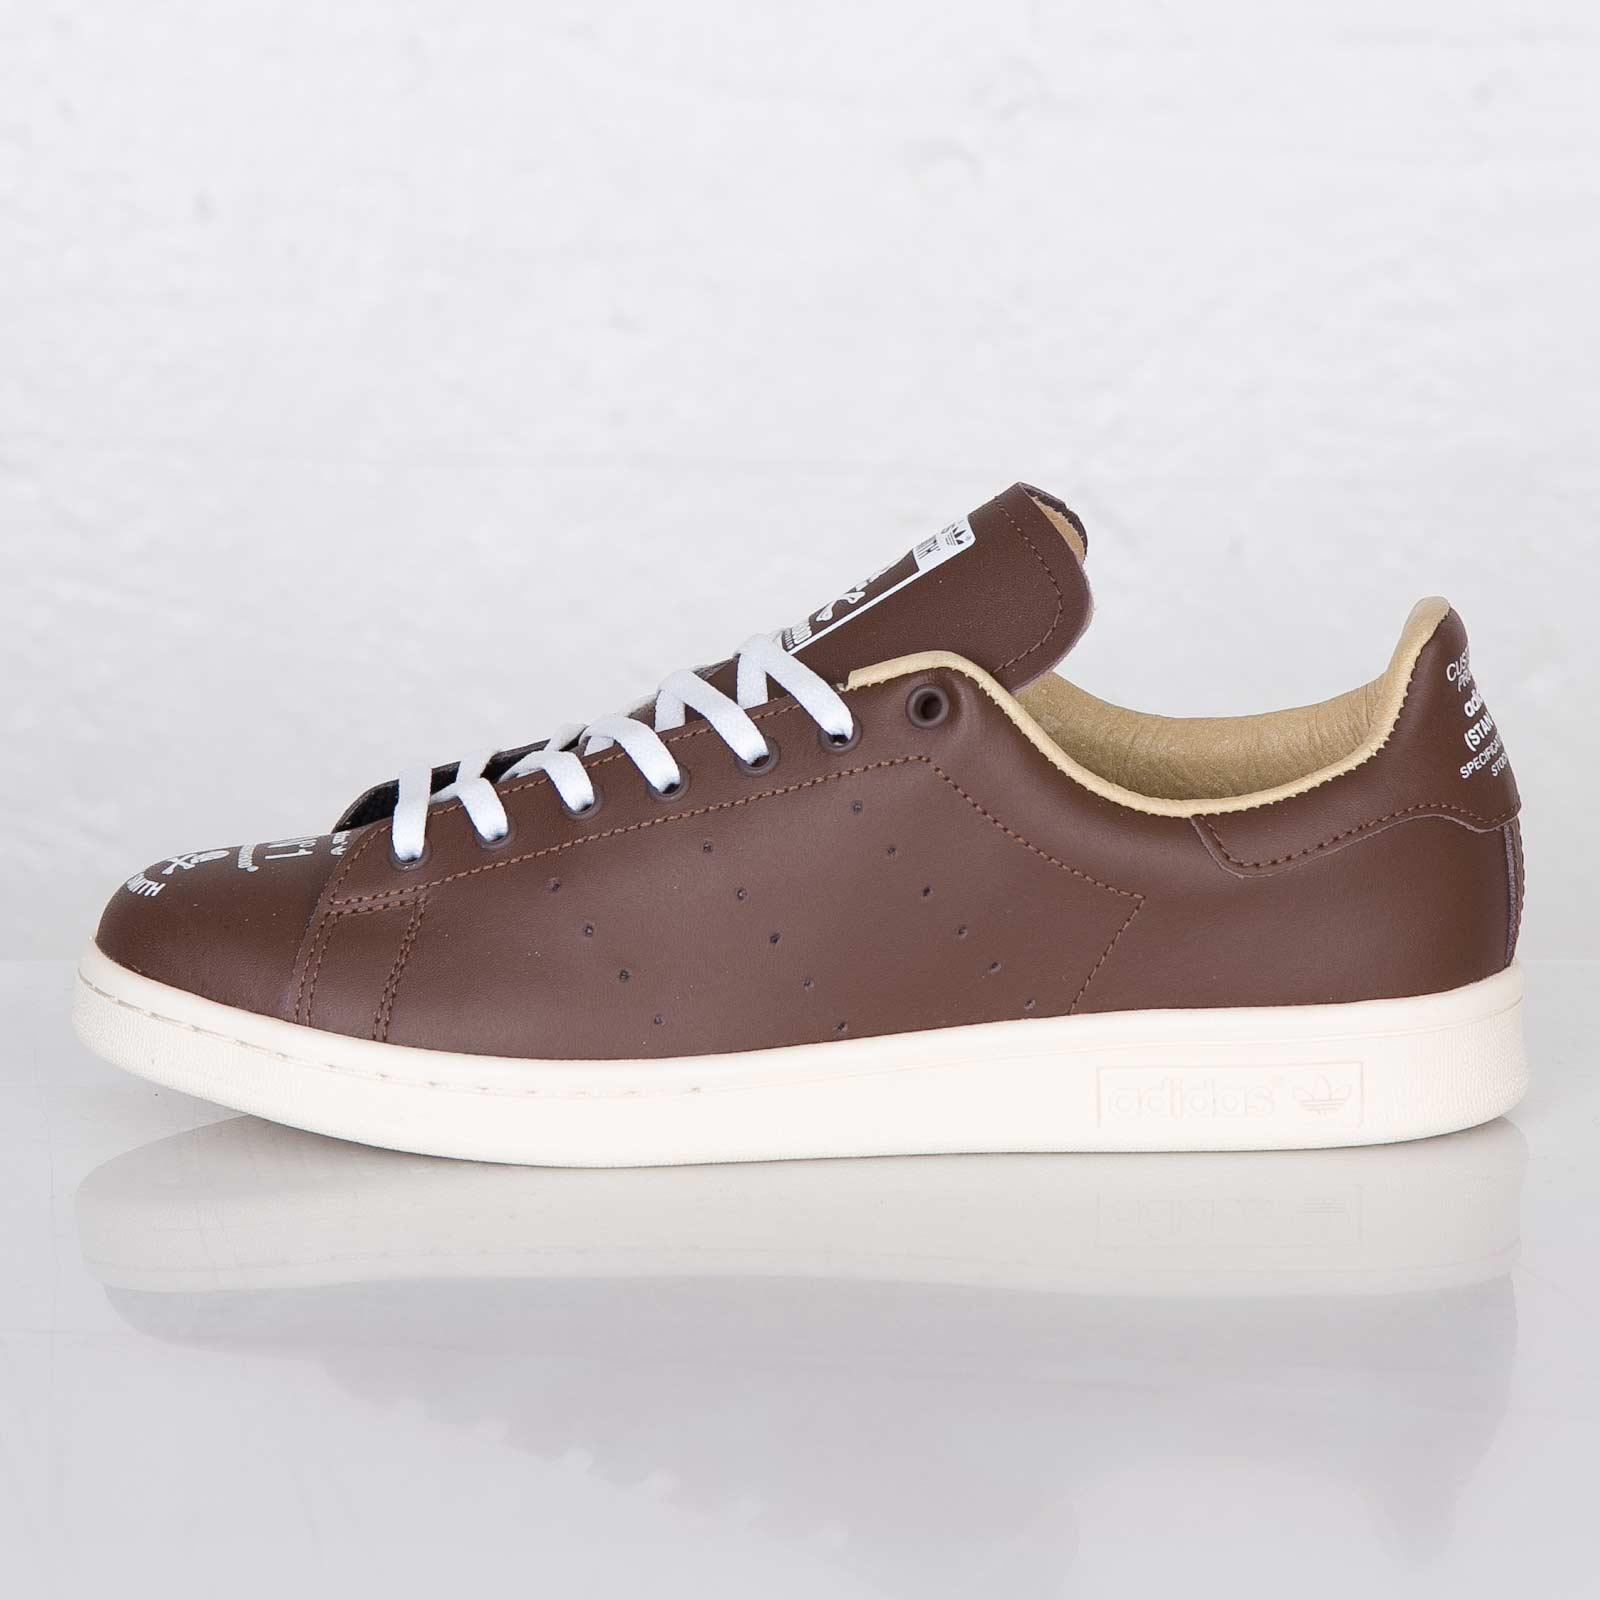 f80c2fb166876 adidas Stan Smith - Neighborhood - M22698 - Sneakersnstuff ...